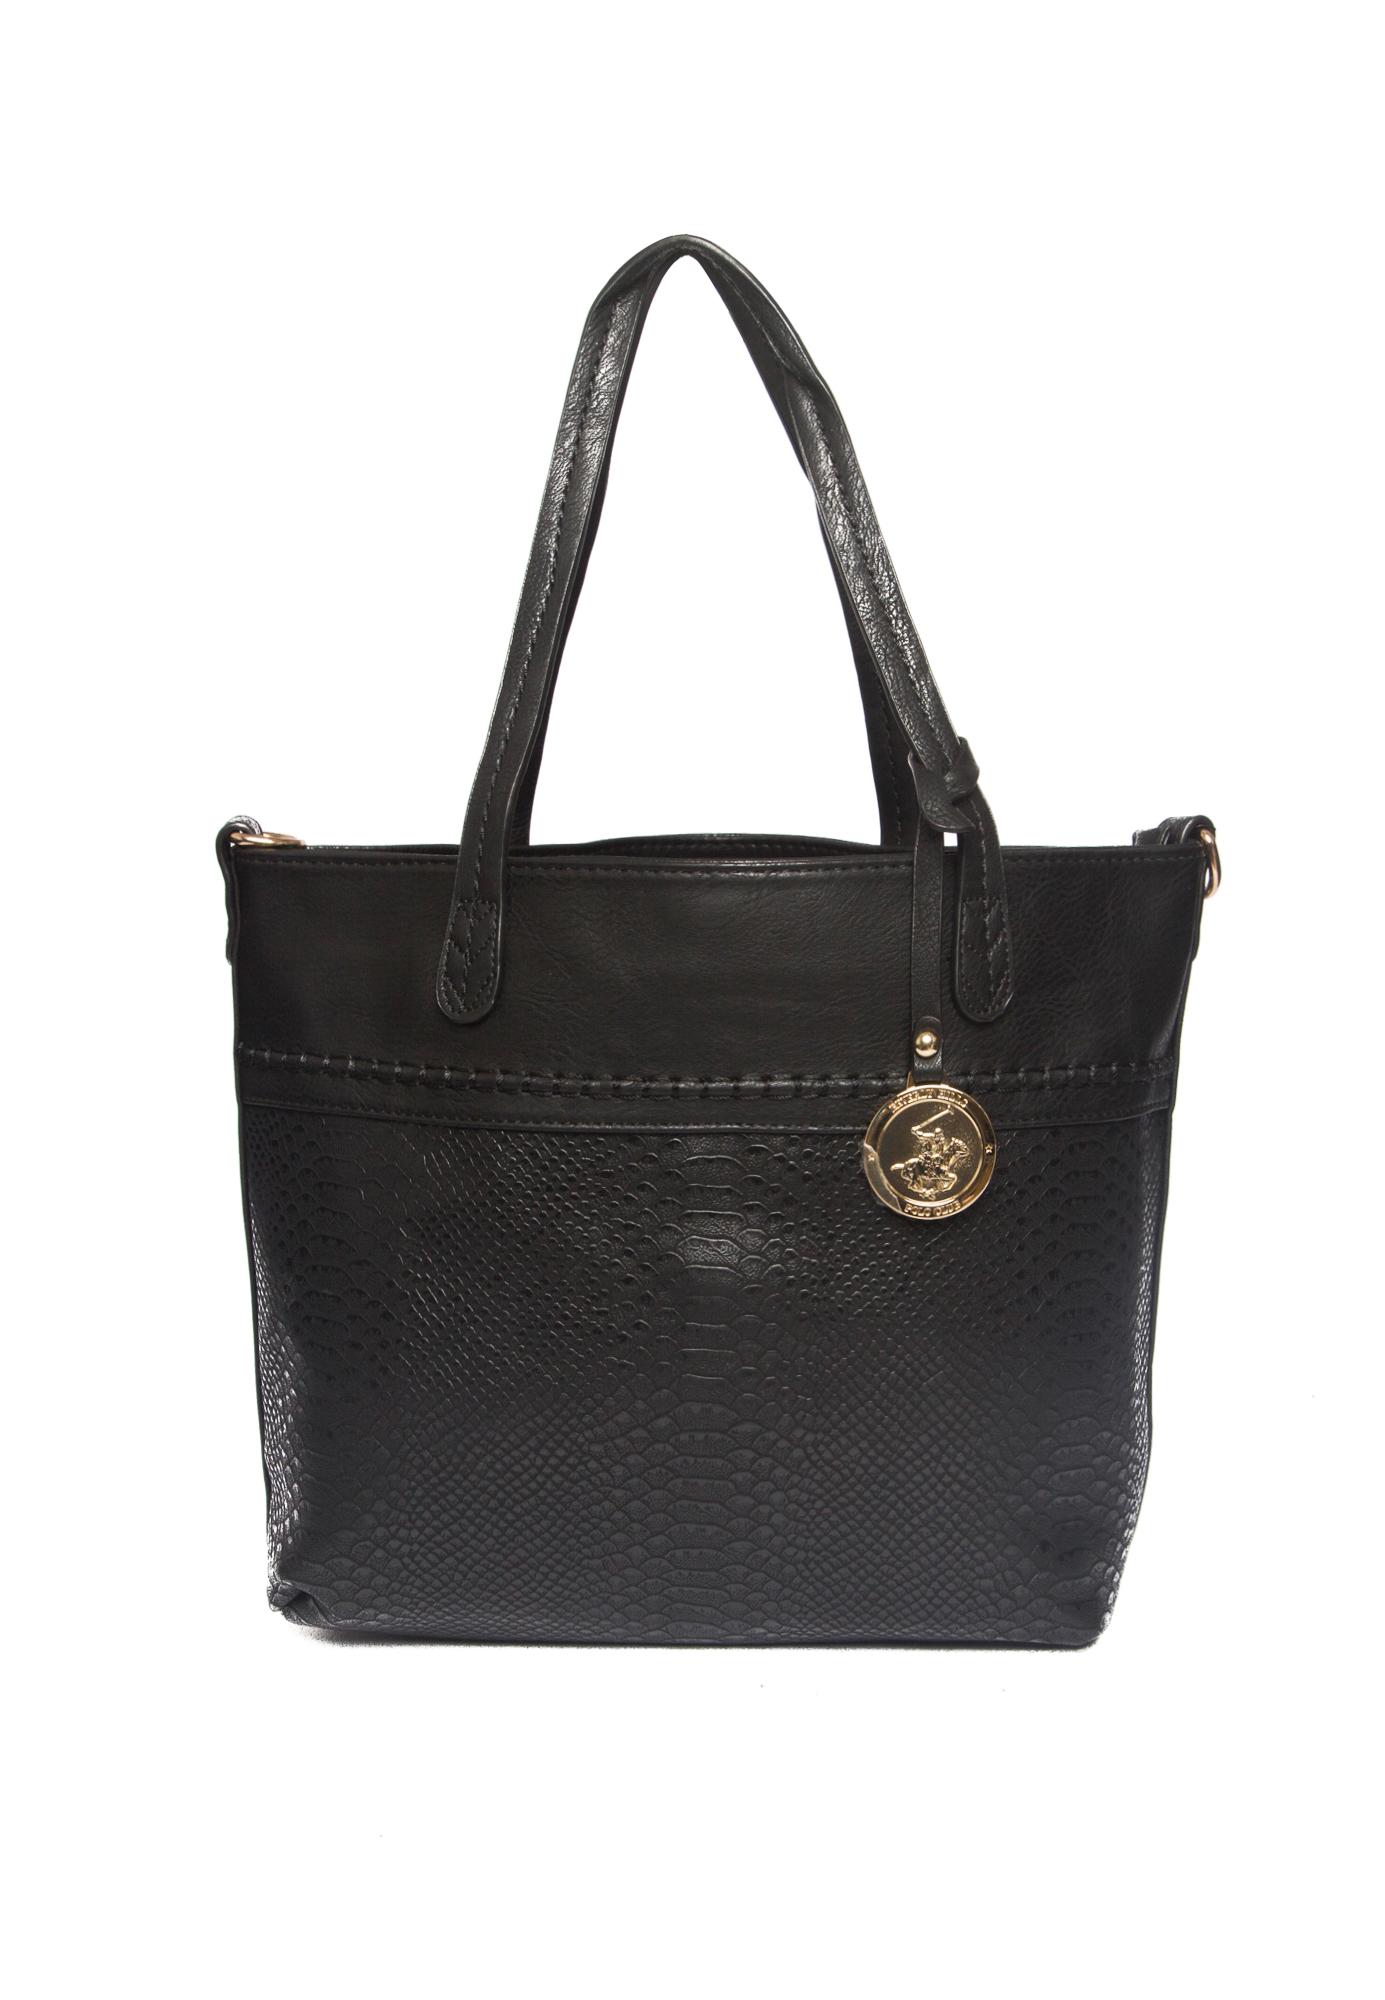 Beverly Hills Polo Club Beverly Hills Polo Club Stockard Hand Bag - Black